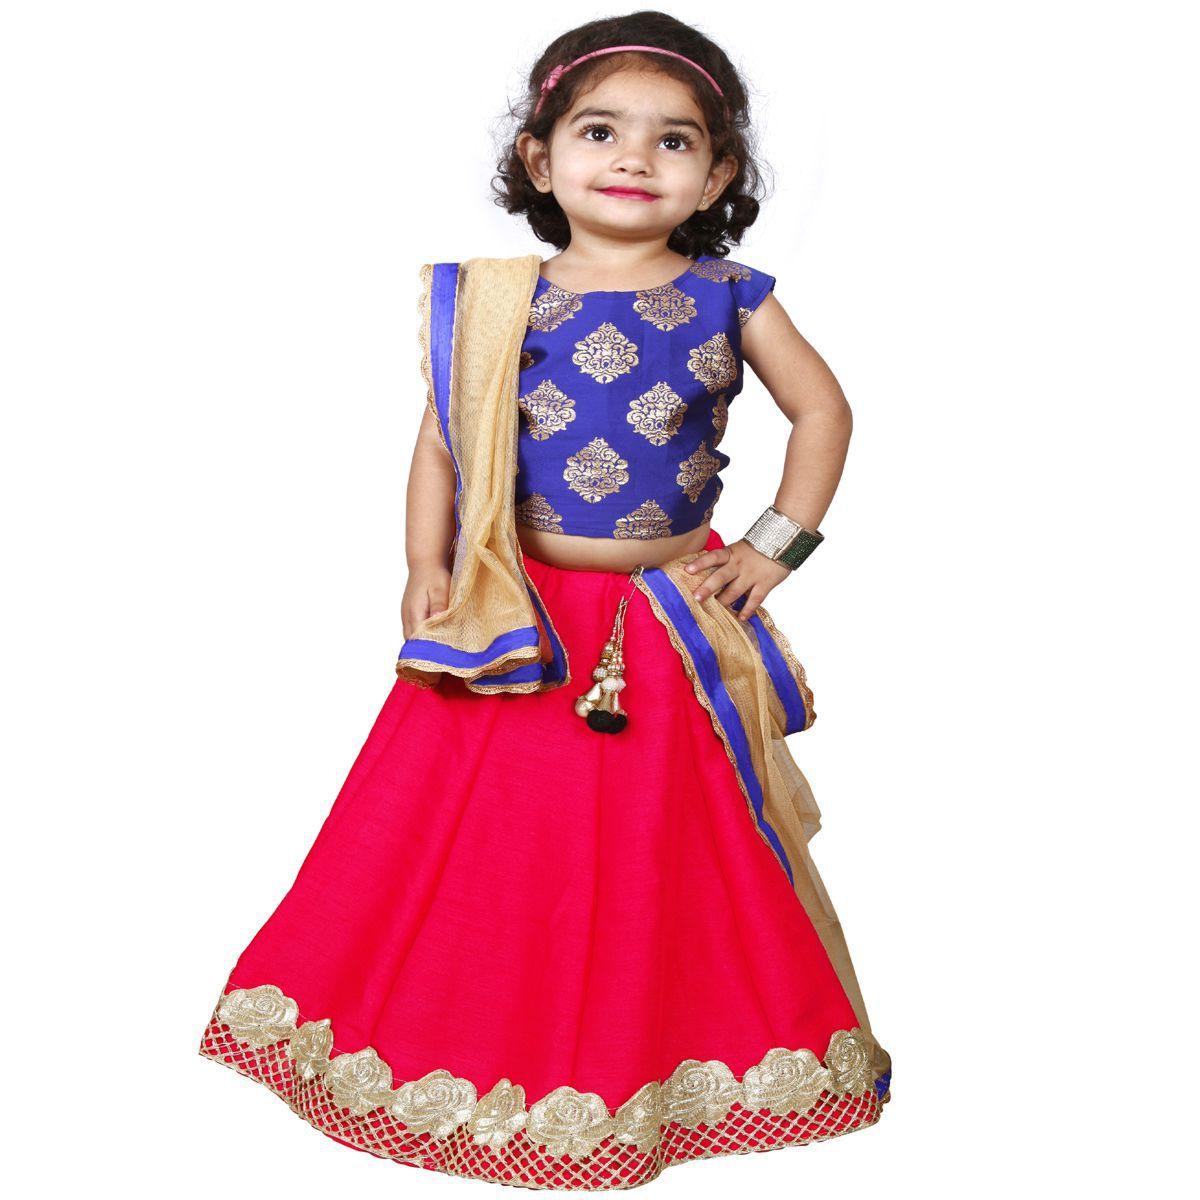 d1bf17500f3c NAJARA FASHION Kids Wear Embroidered Lehenga